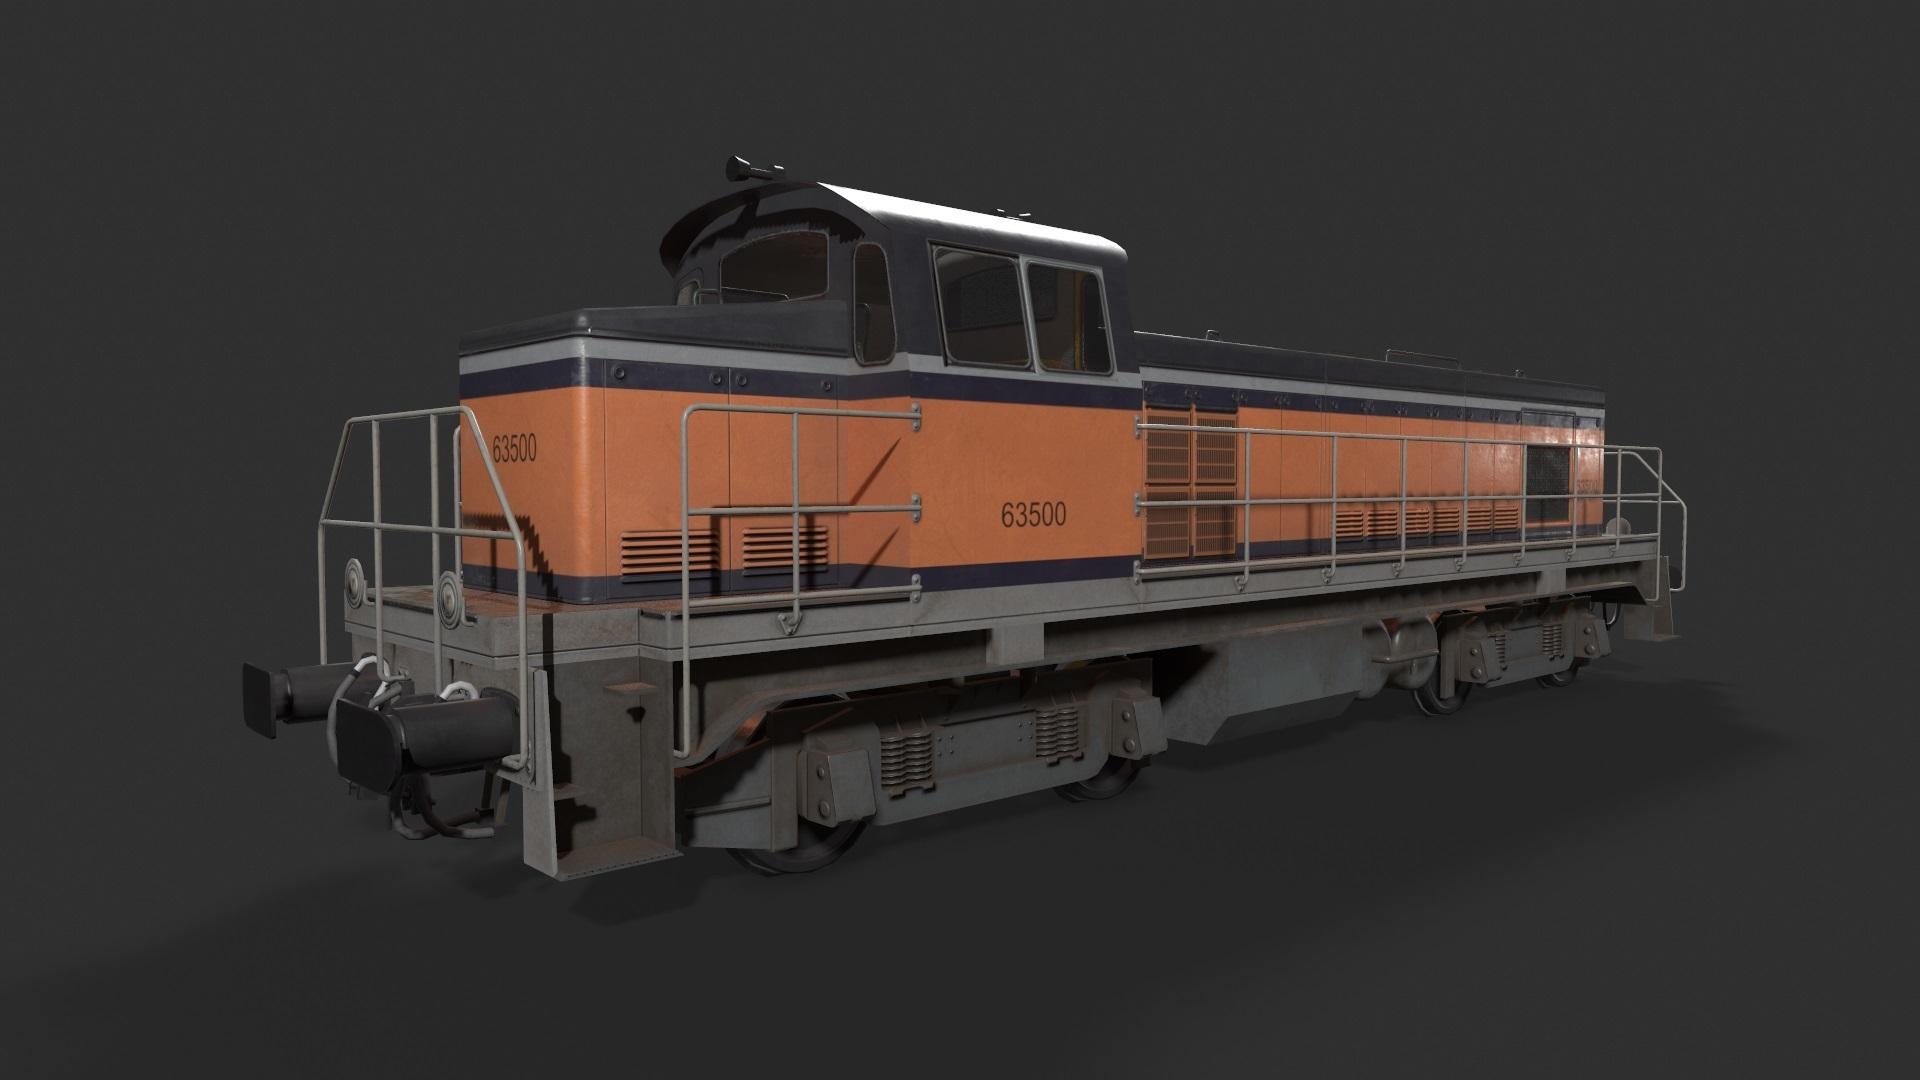 SNCF_BB63500_1.thumb.jpg.216ef84cf44555fb72b419b7f9024dc4.jpg